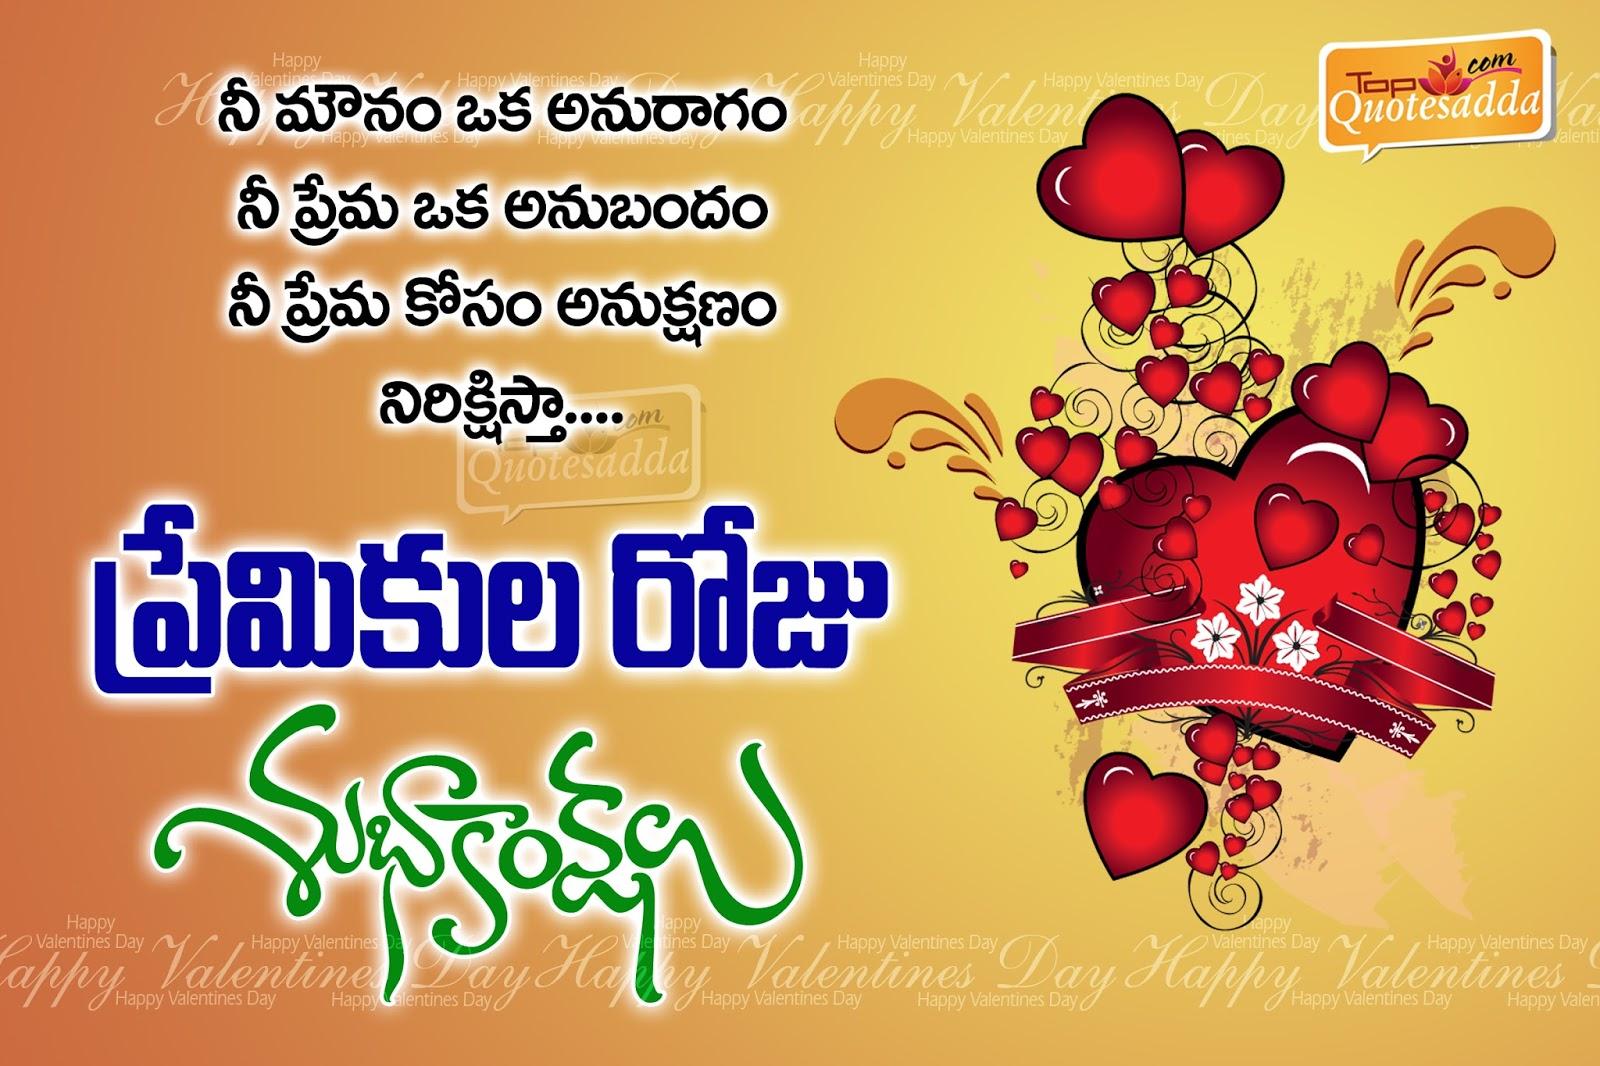 Telugu Valentines Day Greetings Prema Kavitalu In Telugu